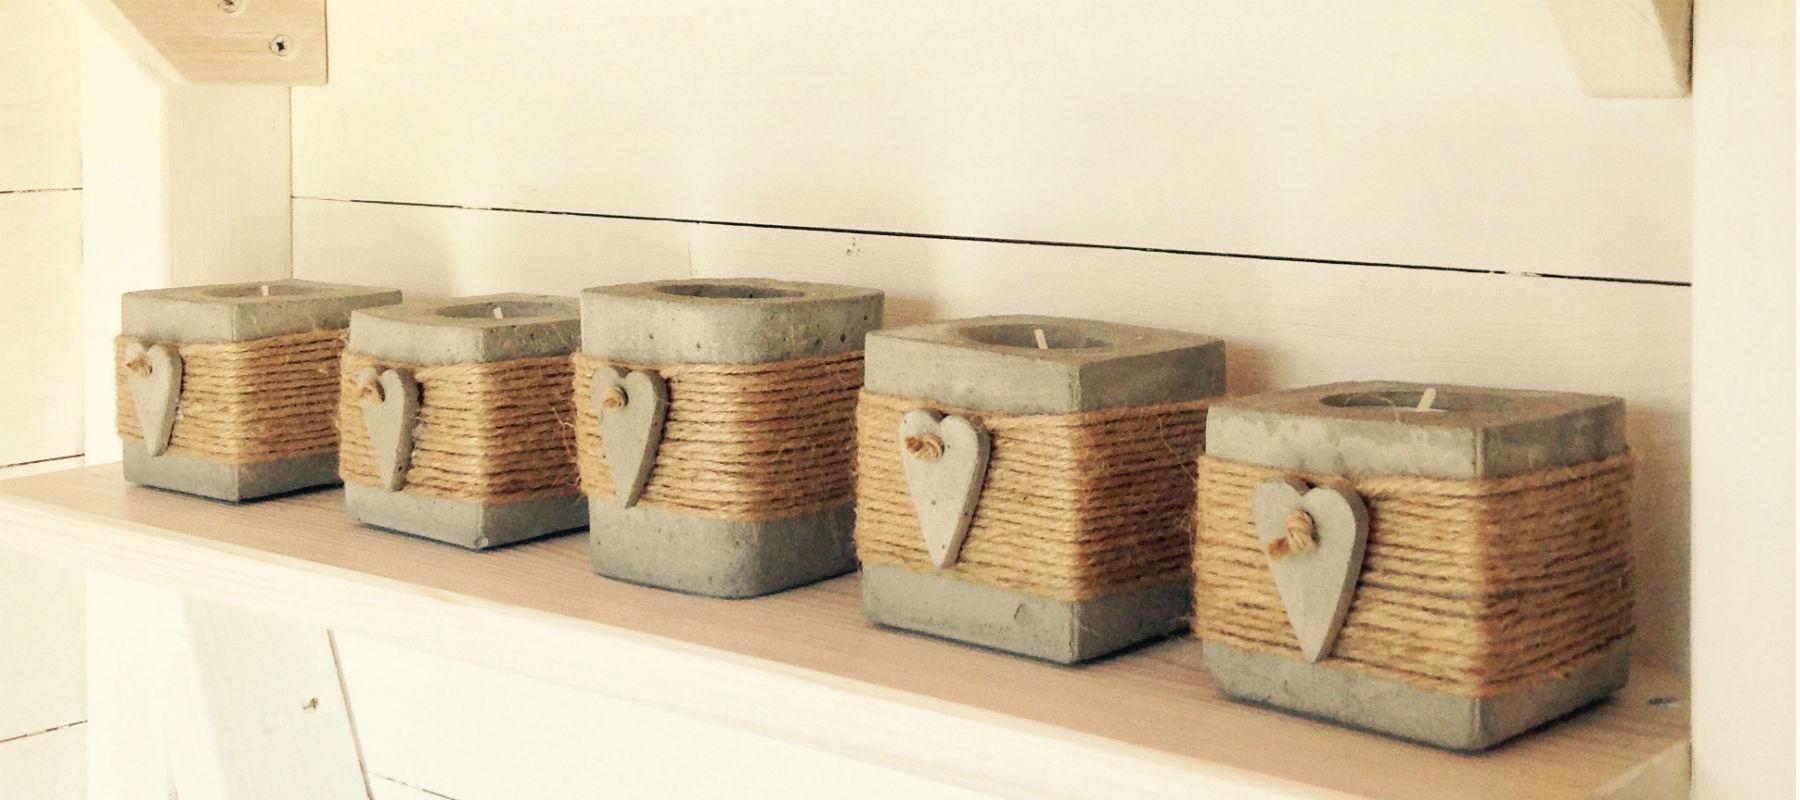 herzen beton 02 kunst aus beton. Black Bedroom Furniture Sets. Home Design Ideas